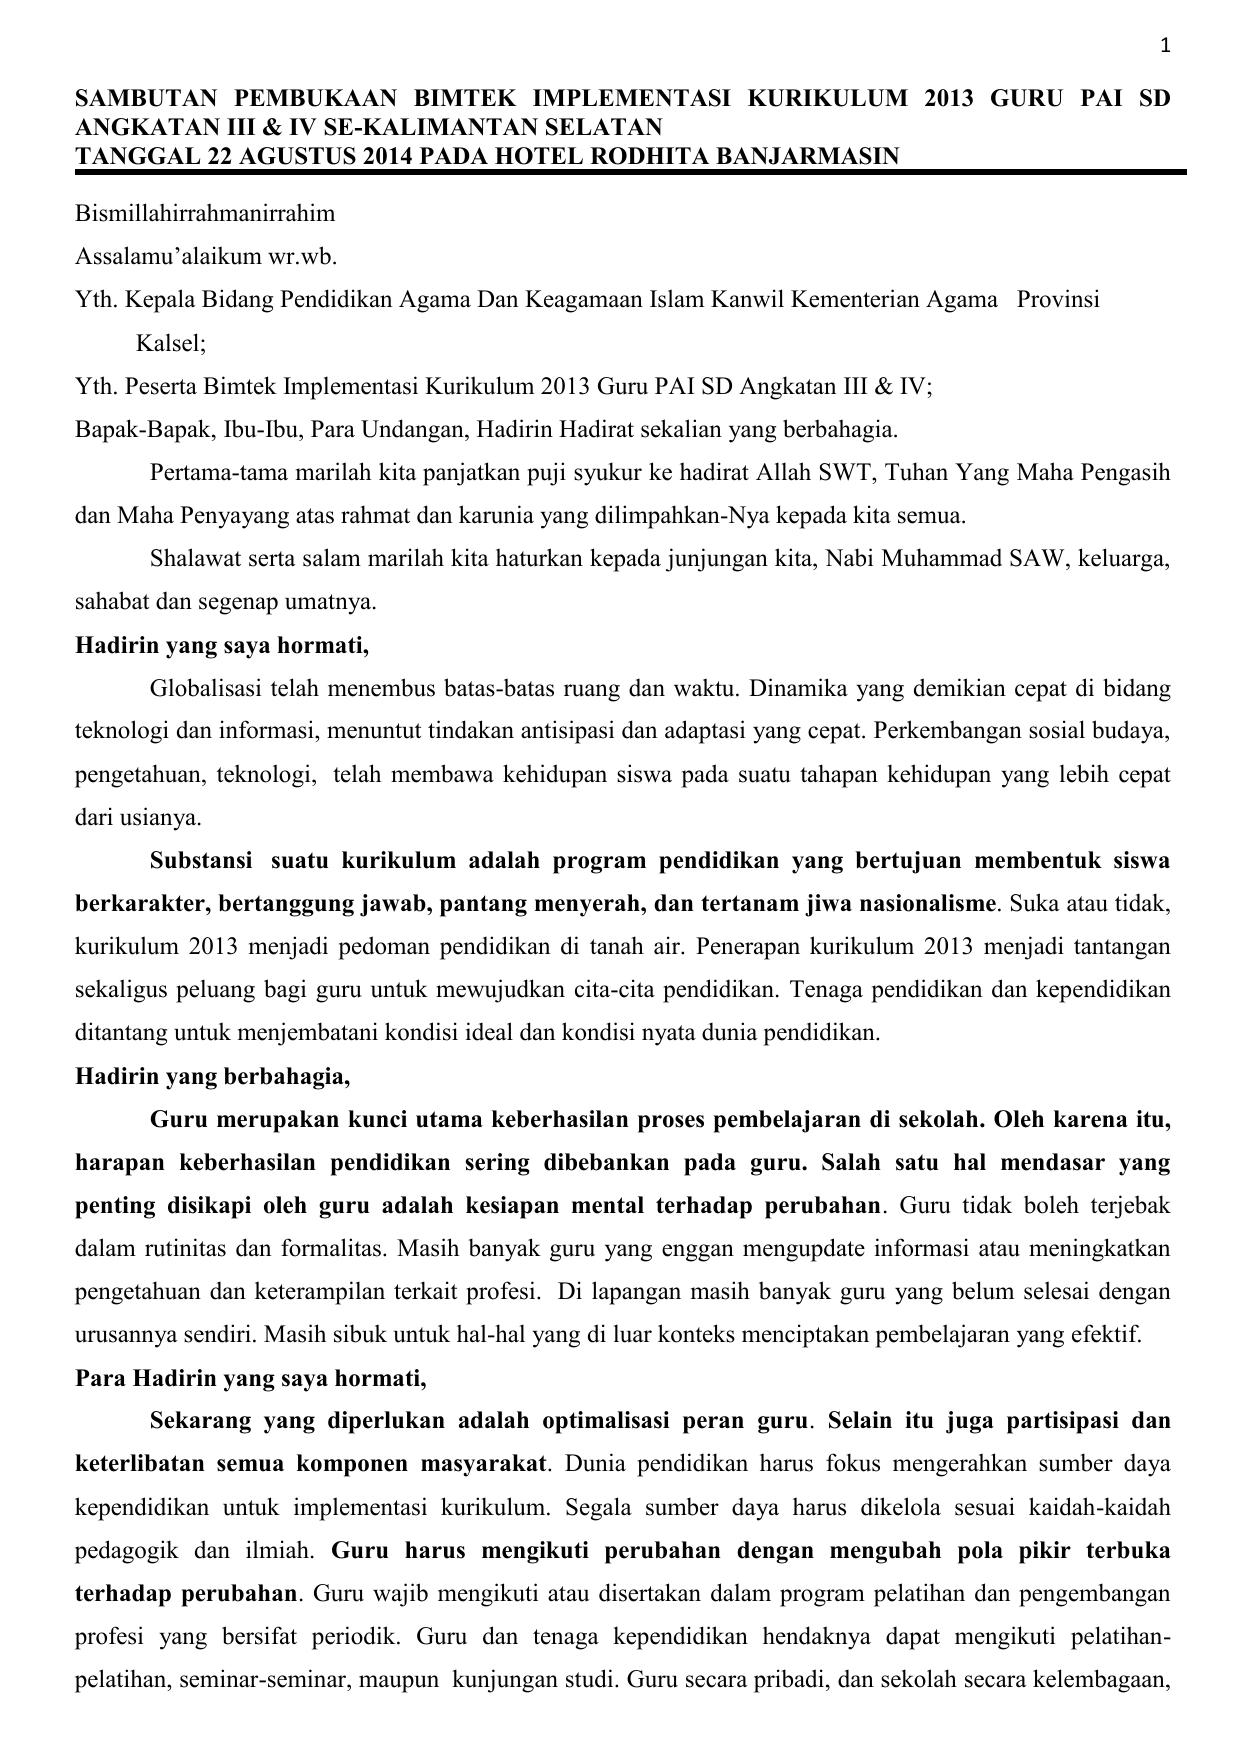 Sambutan Pembukaan Bimtek Implementasi Kurikulum 2013 Guru